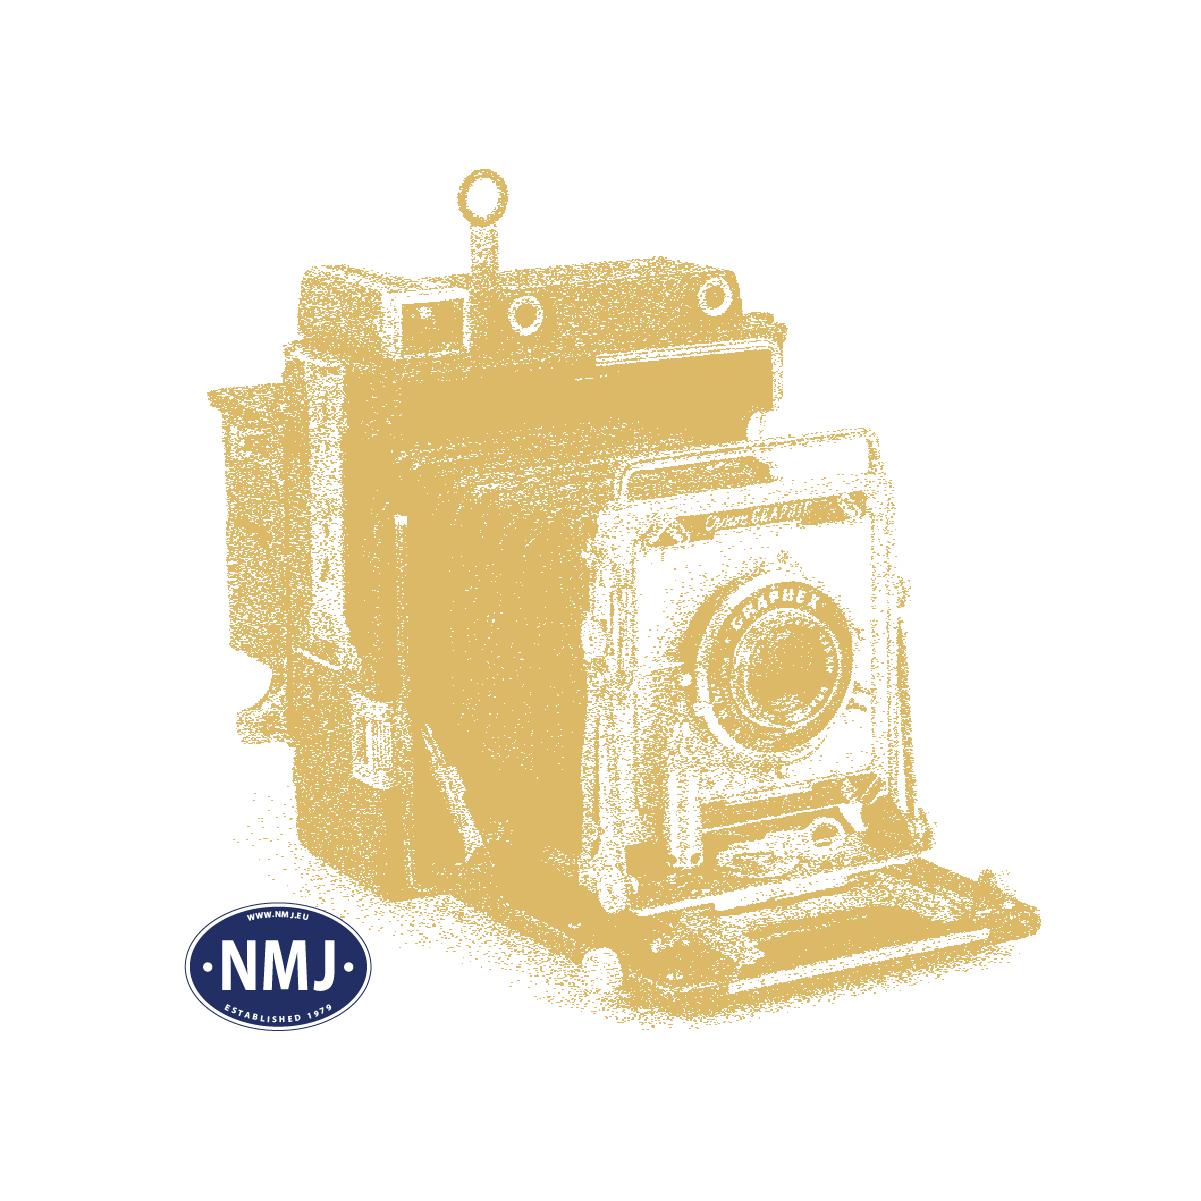 NMJT84.990 - NMJ Topline NSB BM69a Interiørlyssett